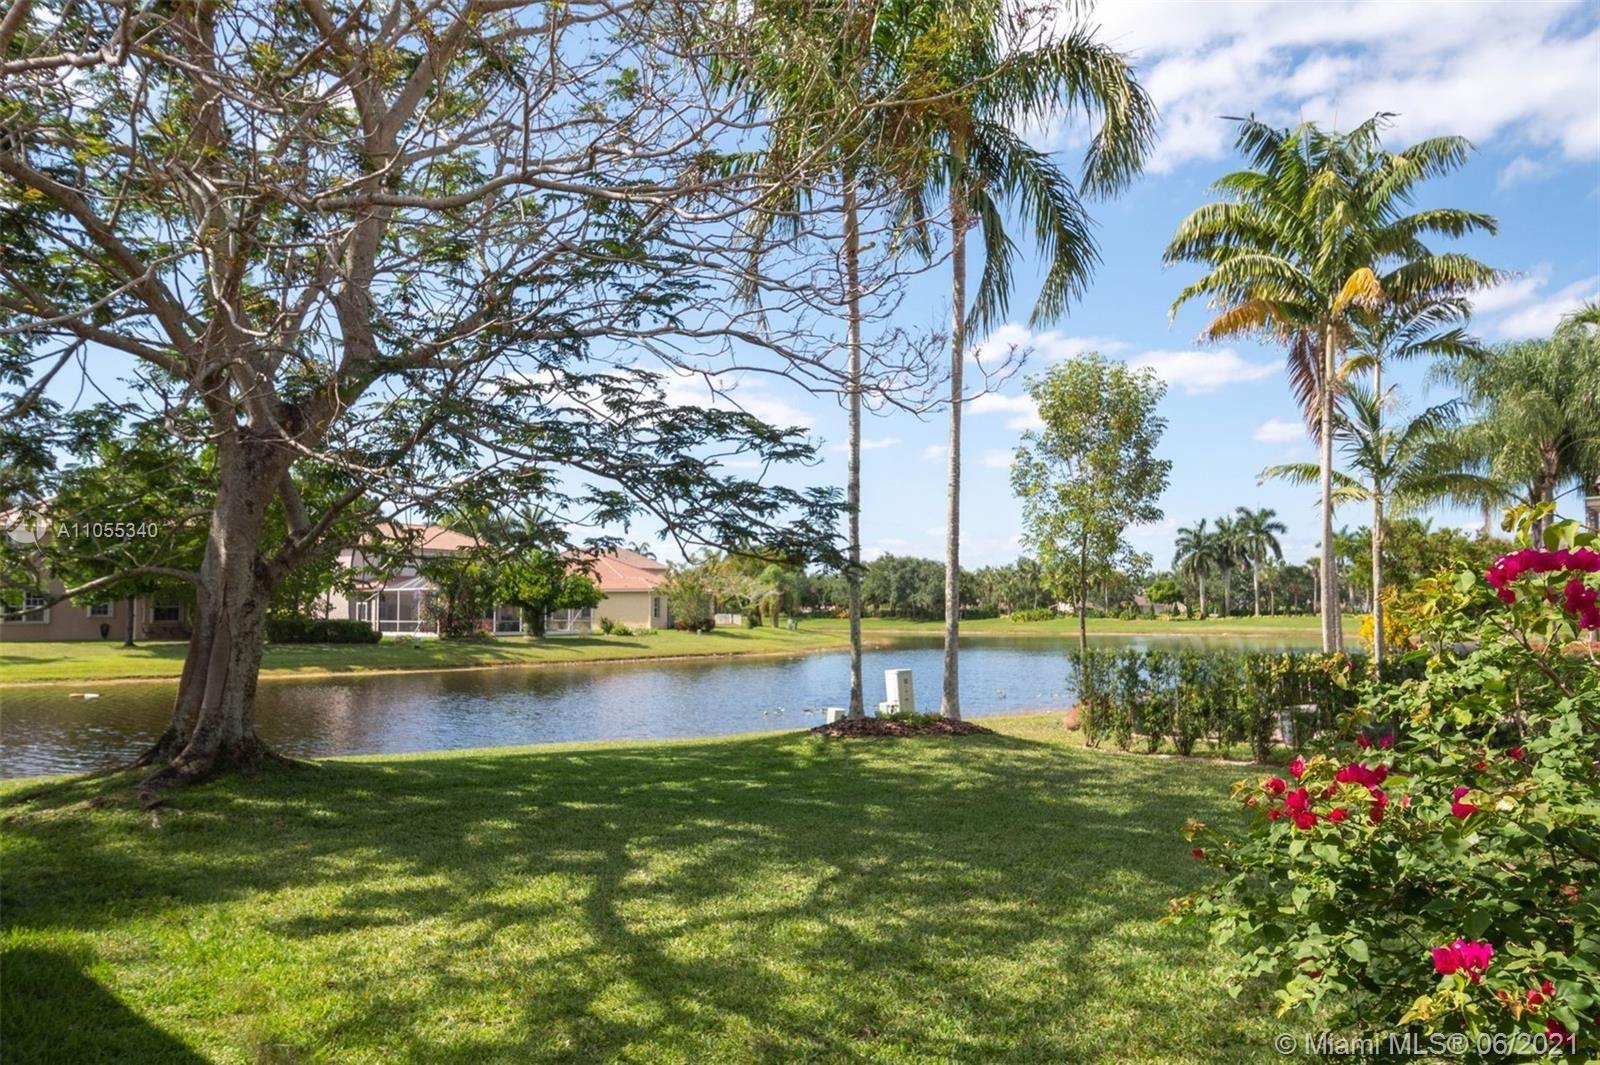 962 Golden Cane Dr, Weston, FL 33327 - #: A11055340